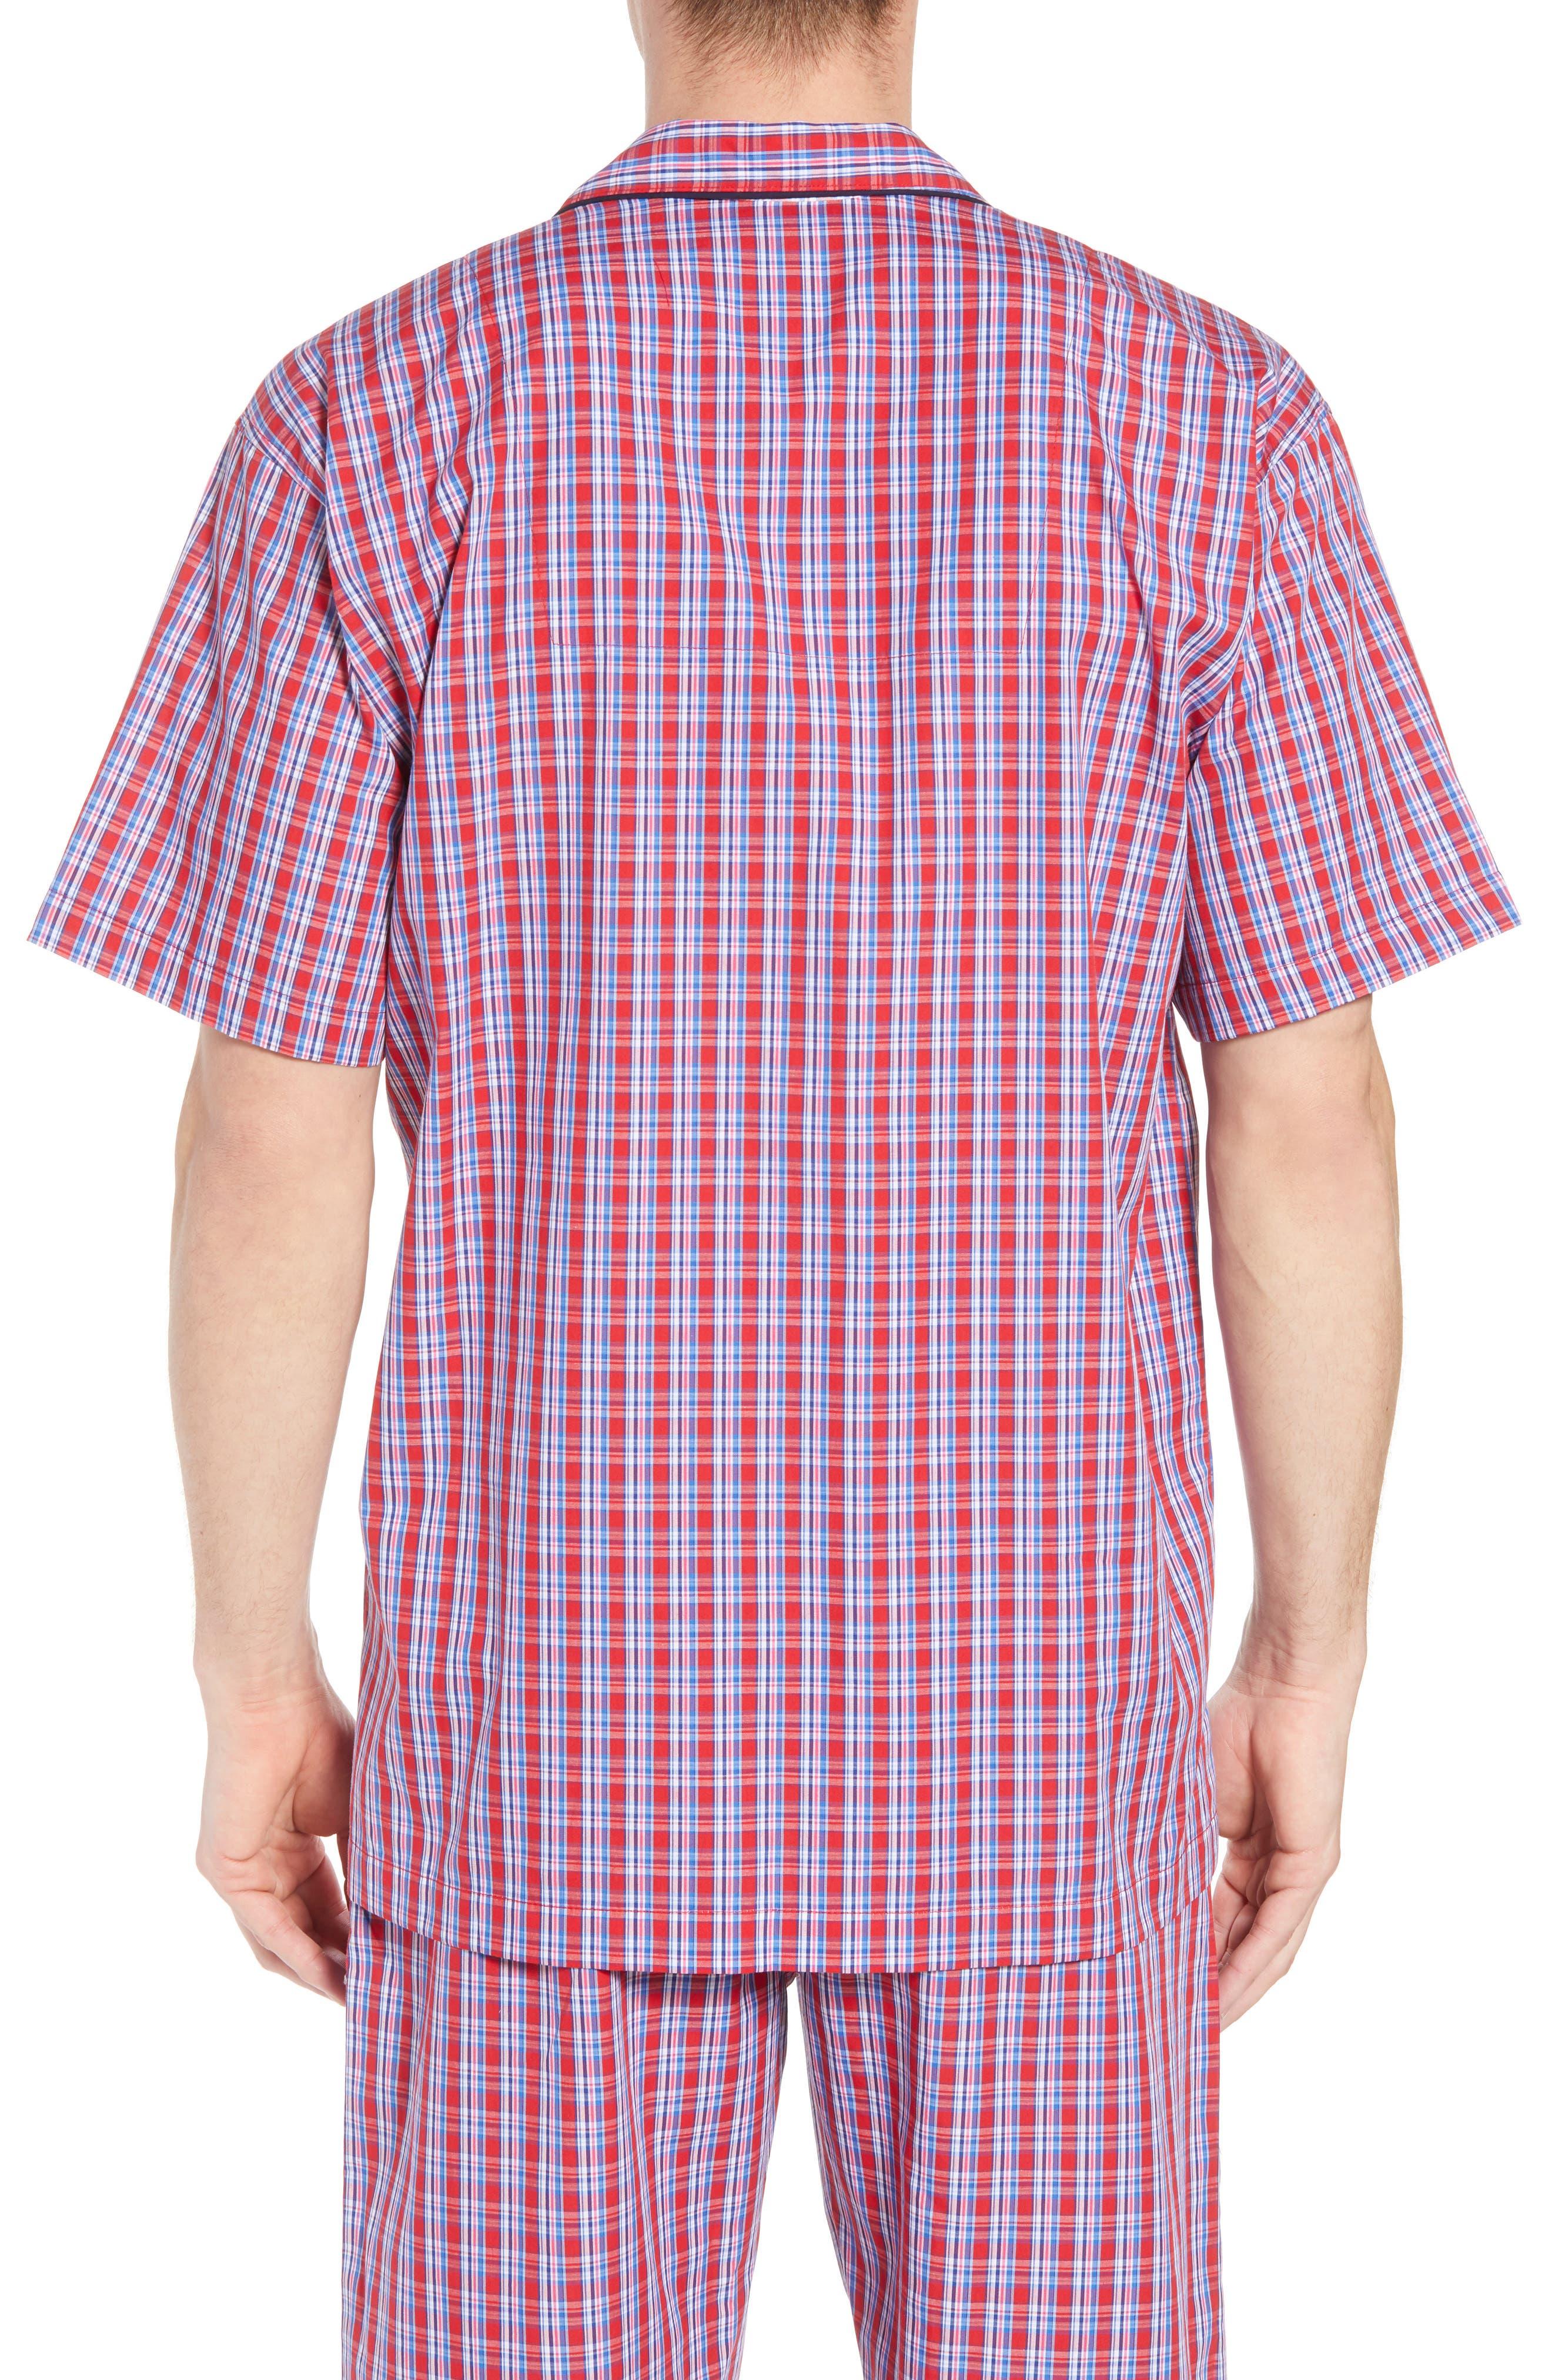 Cotton Pajama Shirt,                             Alternate thumbnail 2, color,                             NEWPORT PLAID/ NAVY